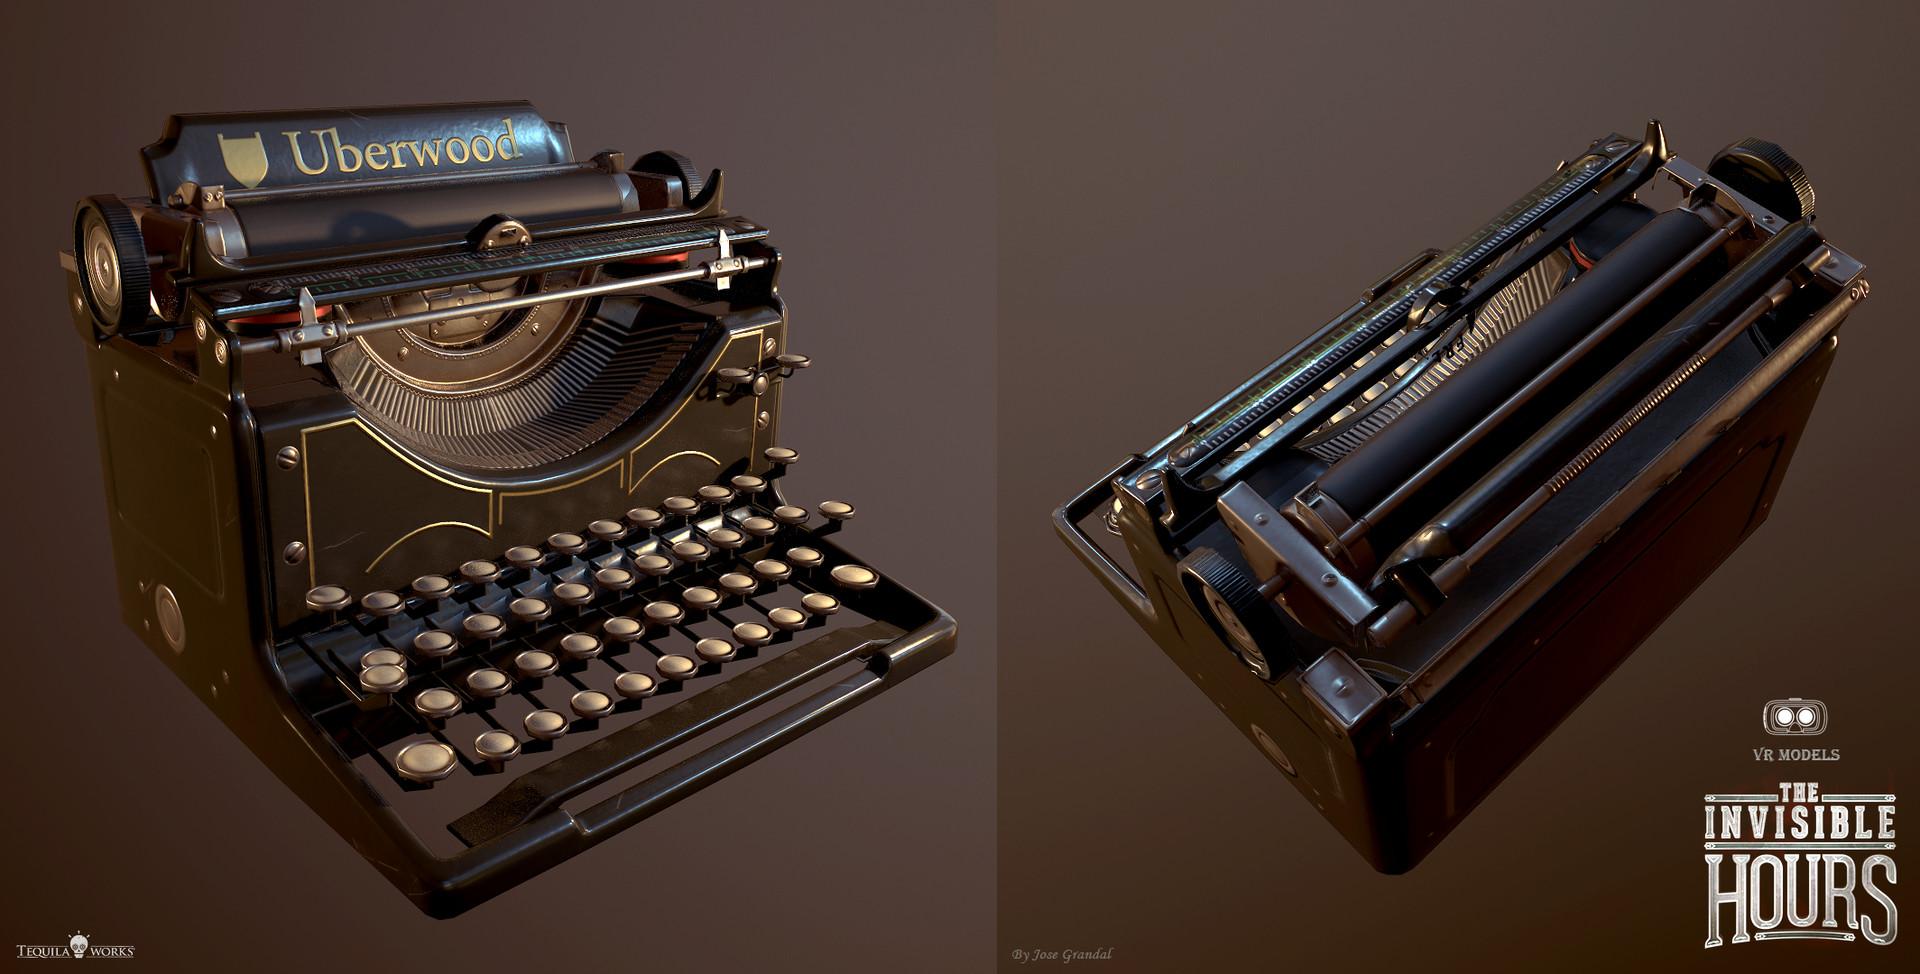 Jose grandal typingmachine 1